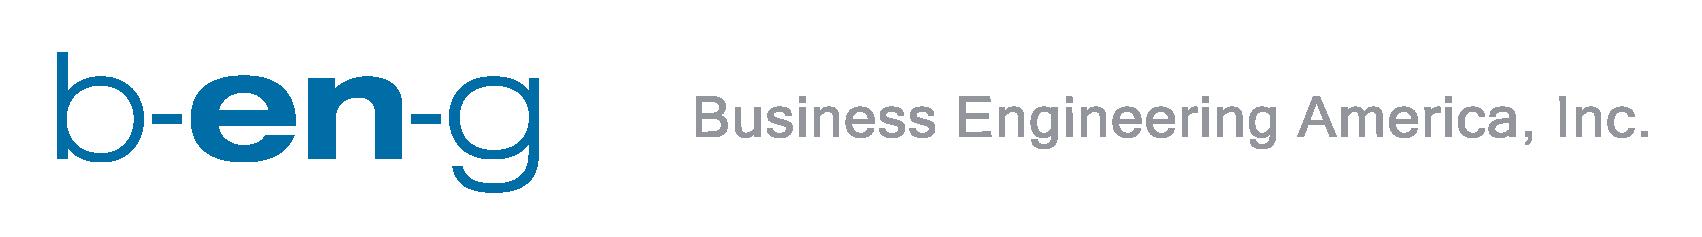 BENG America Logo_horizontal_20200102_v3